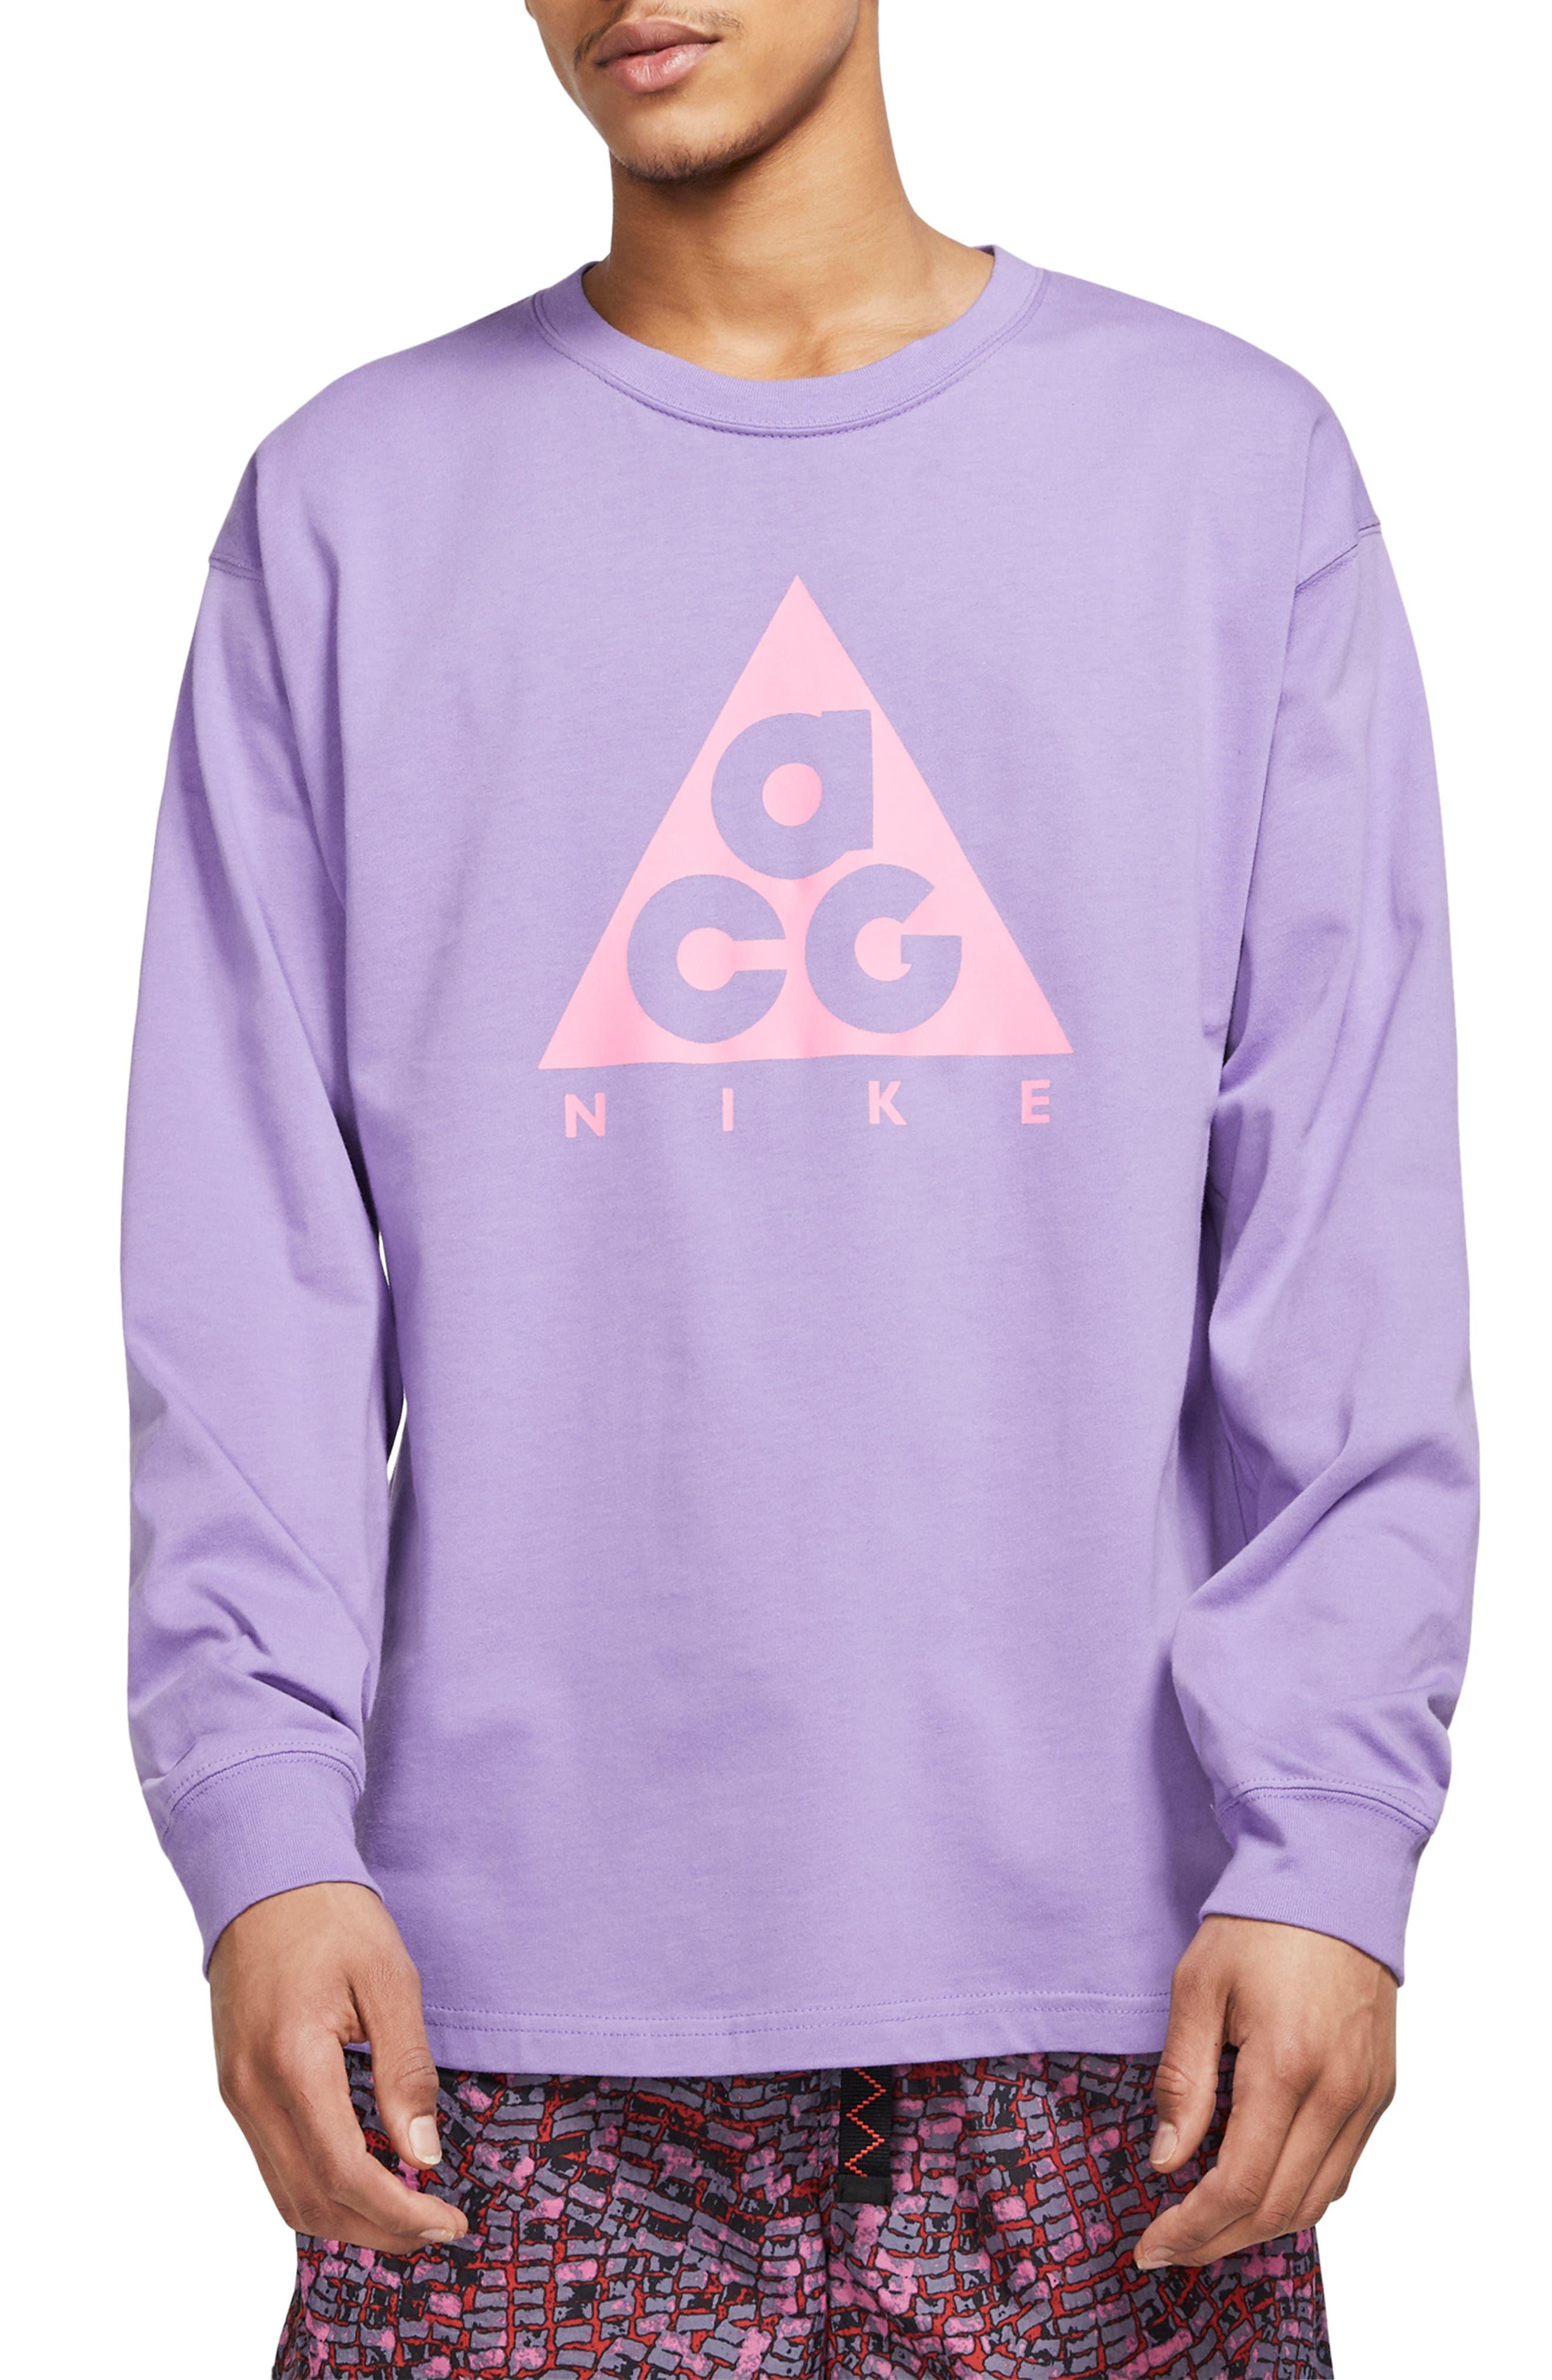 Nike Nrg All Conditions Gear Logo T-Shirt, Purple